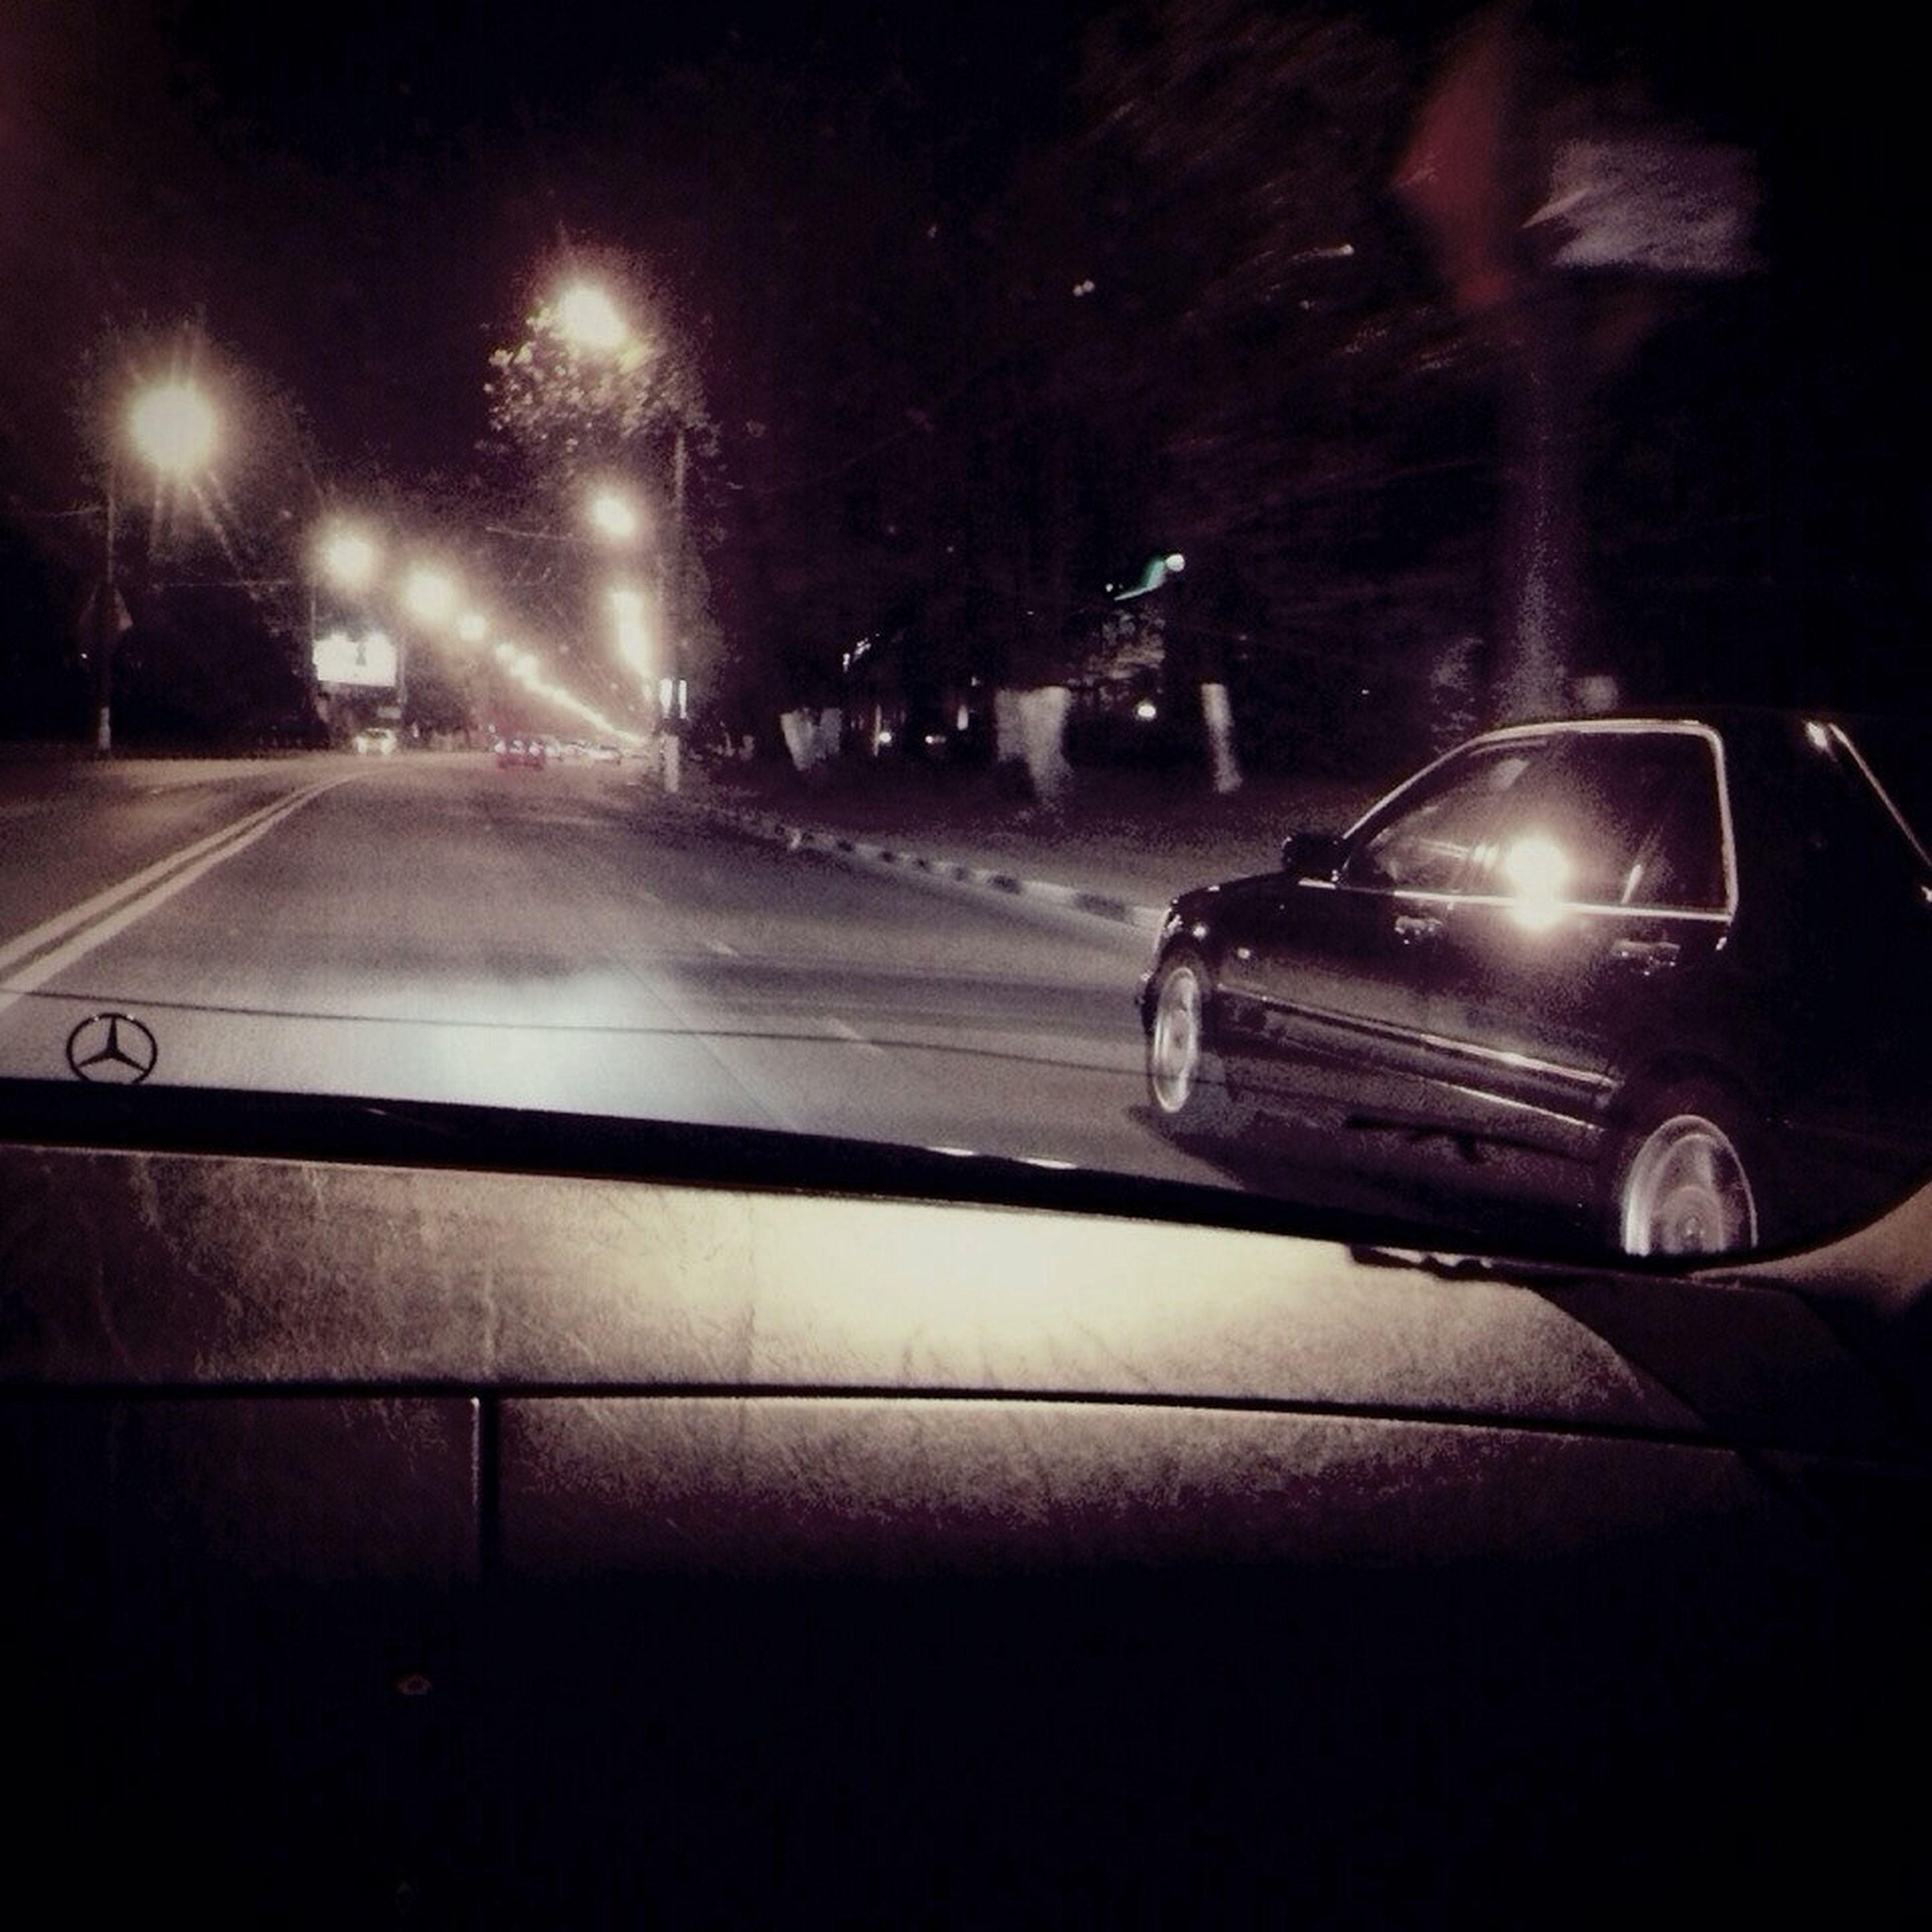 transportation, mode of transport, land vehicle, night, illuminated, car, road, travel, on the move, street, speed, headlight, motion, car interior, windshield, part of, vehicle interior, road marking